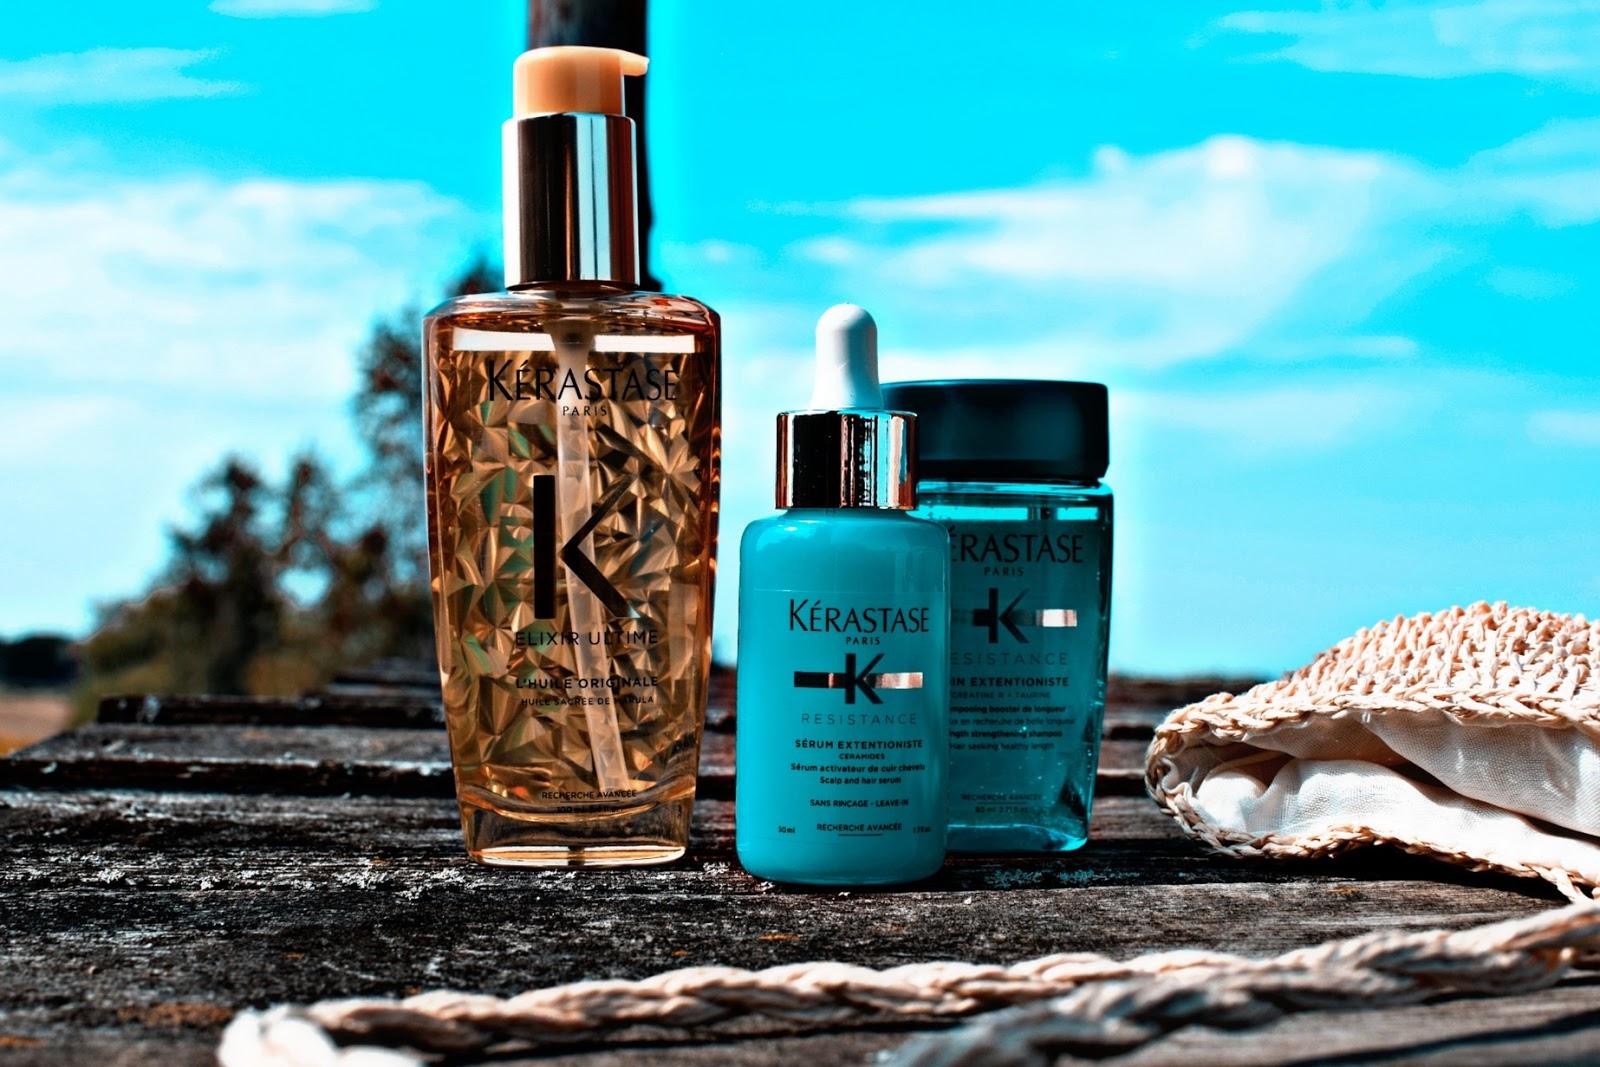 Elixir Ultime L'huile Originale